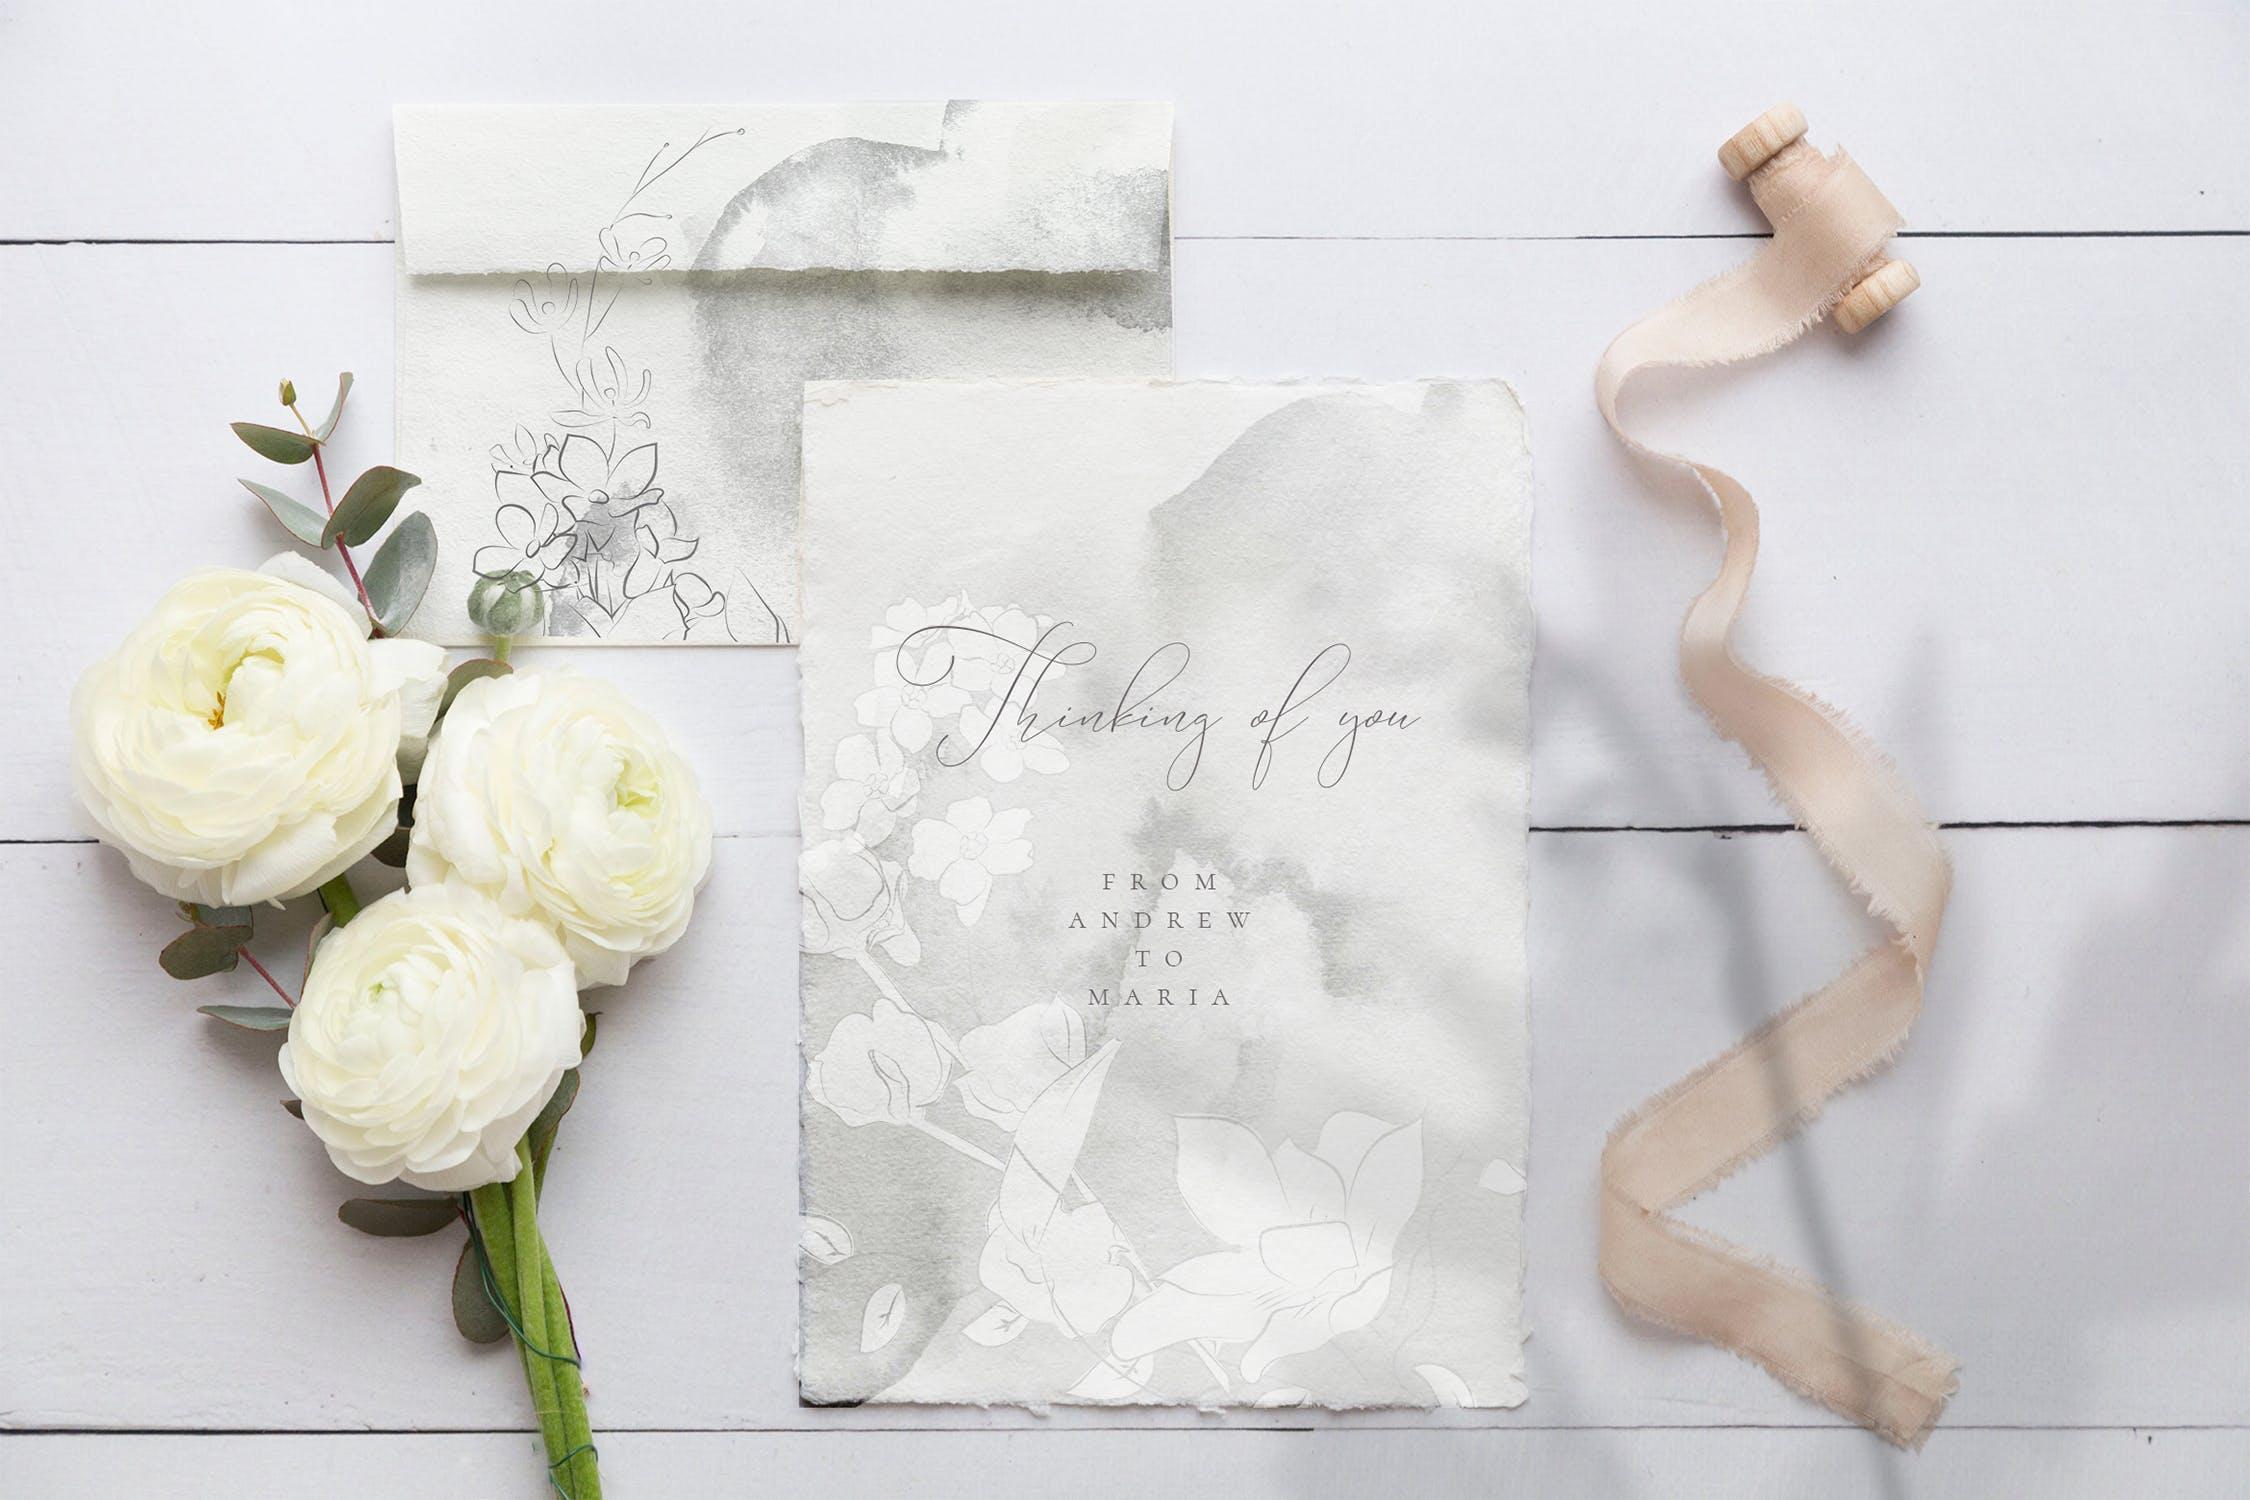 微妙优雅画花卉和图案素材下载Subtle Beauty Graphic Collection插图(2)